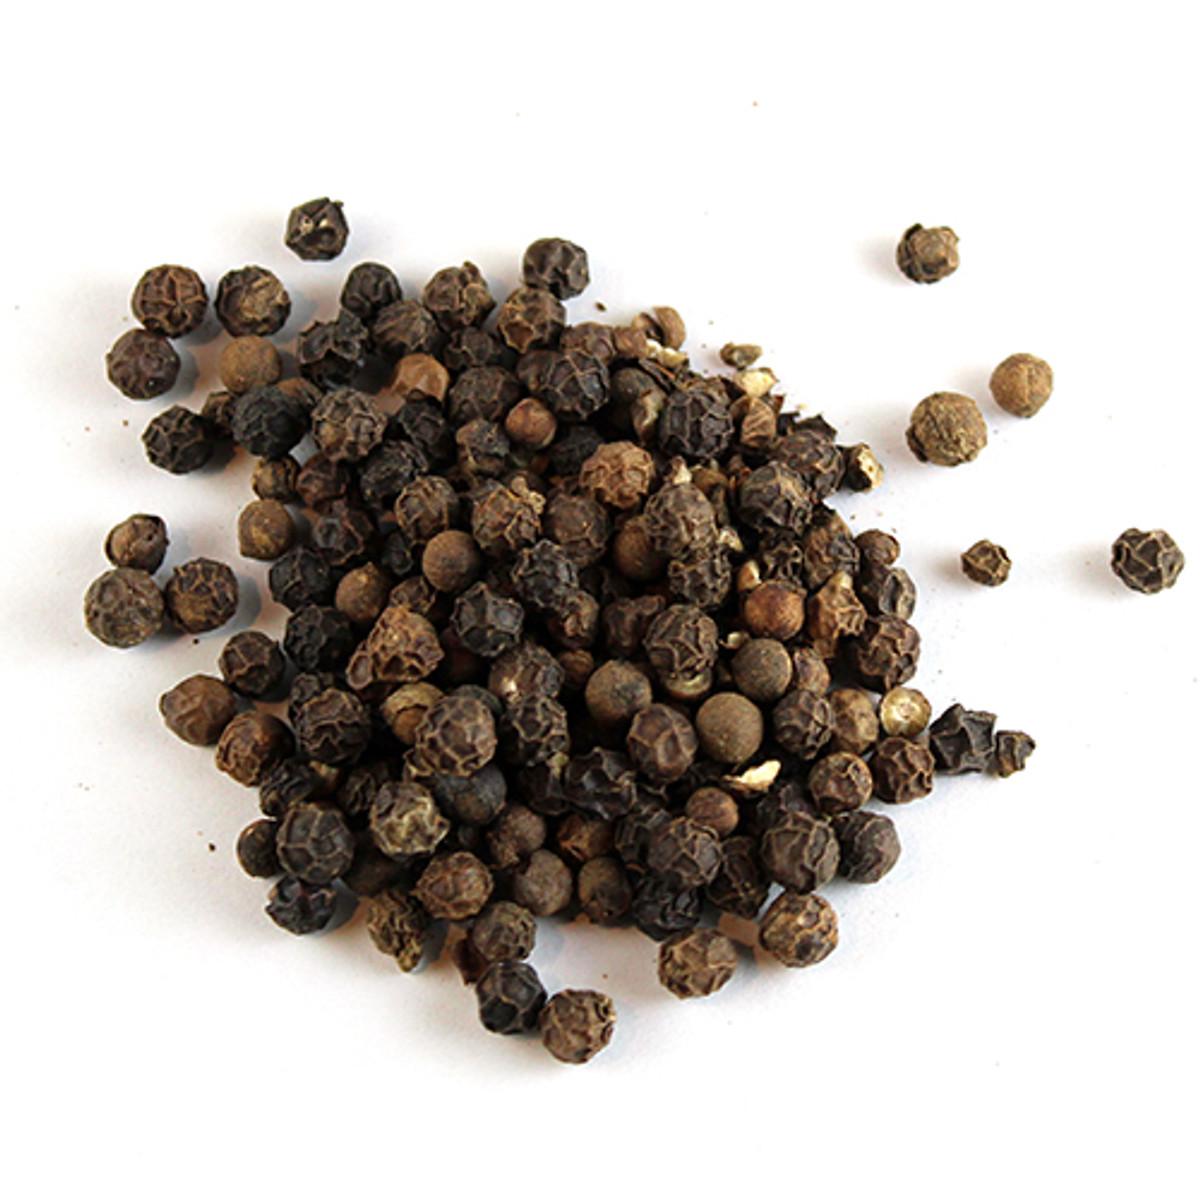 Black Tellicherry Peppercorns - Whole